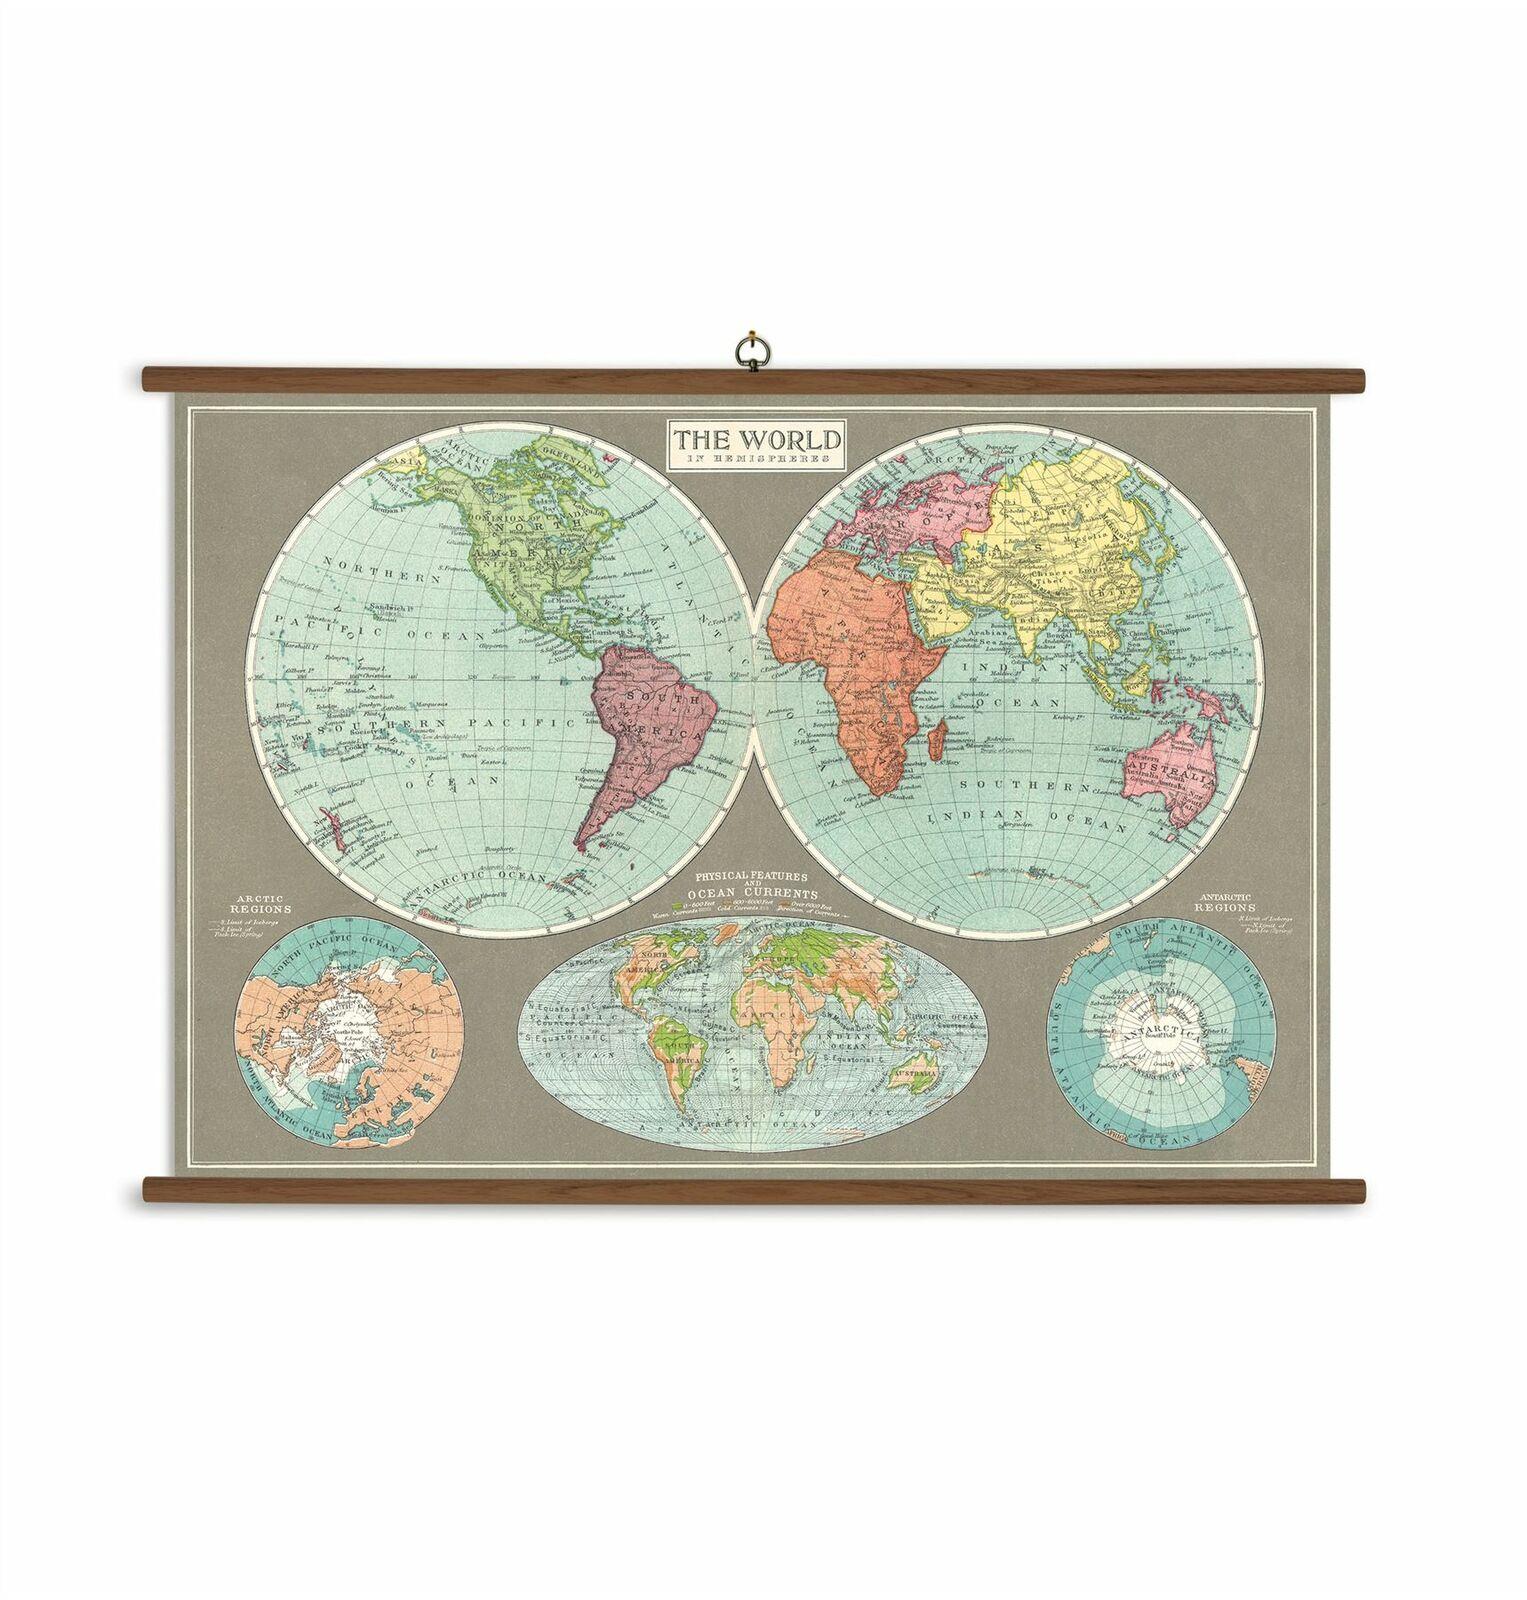 Cavallini - Ready To Hang Vintage School Chart-100x70cms - Hemispheres World Map